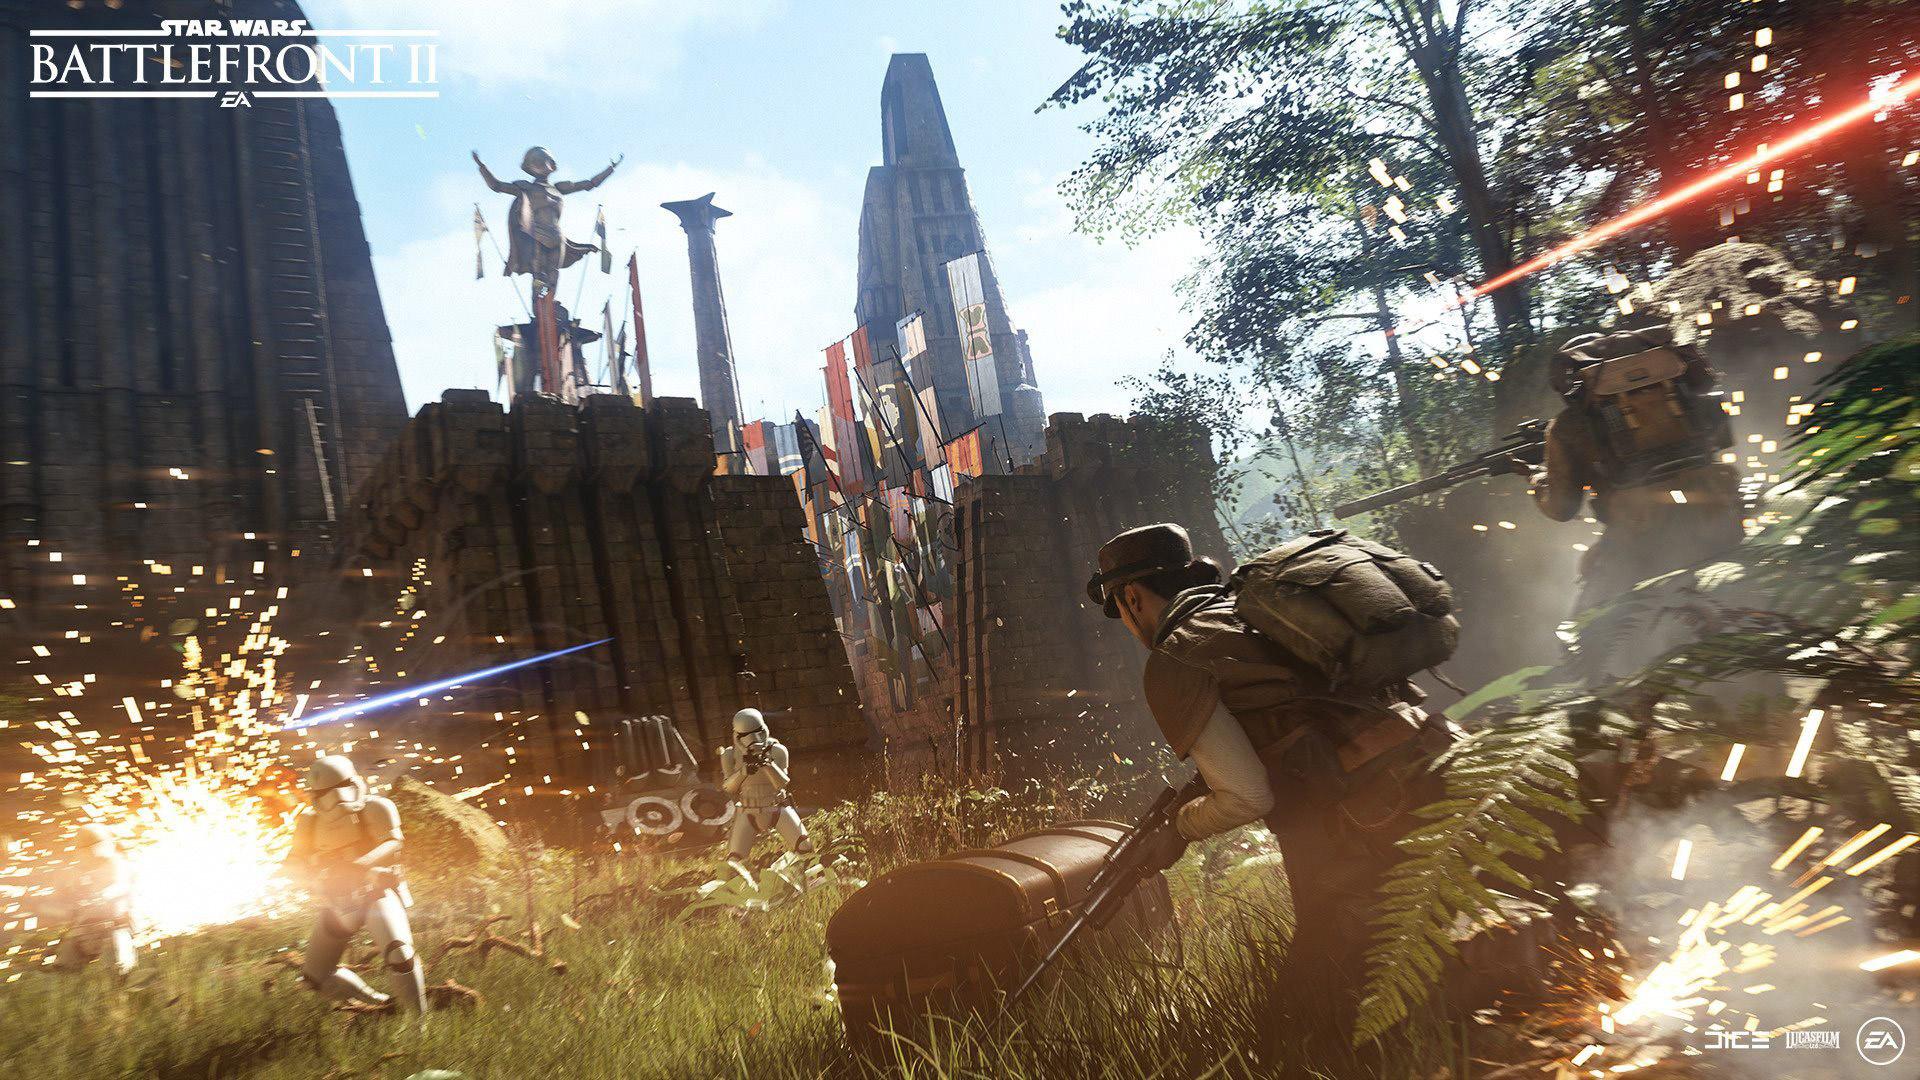 Star Wars Battlefront 2 Background 13